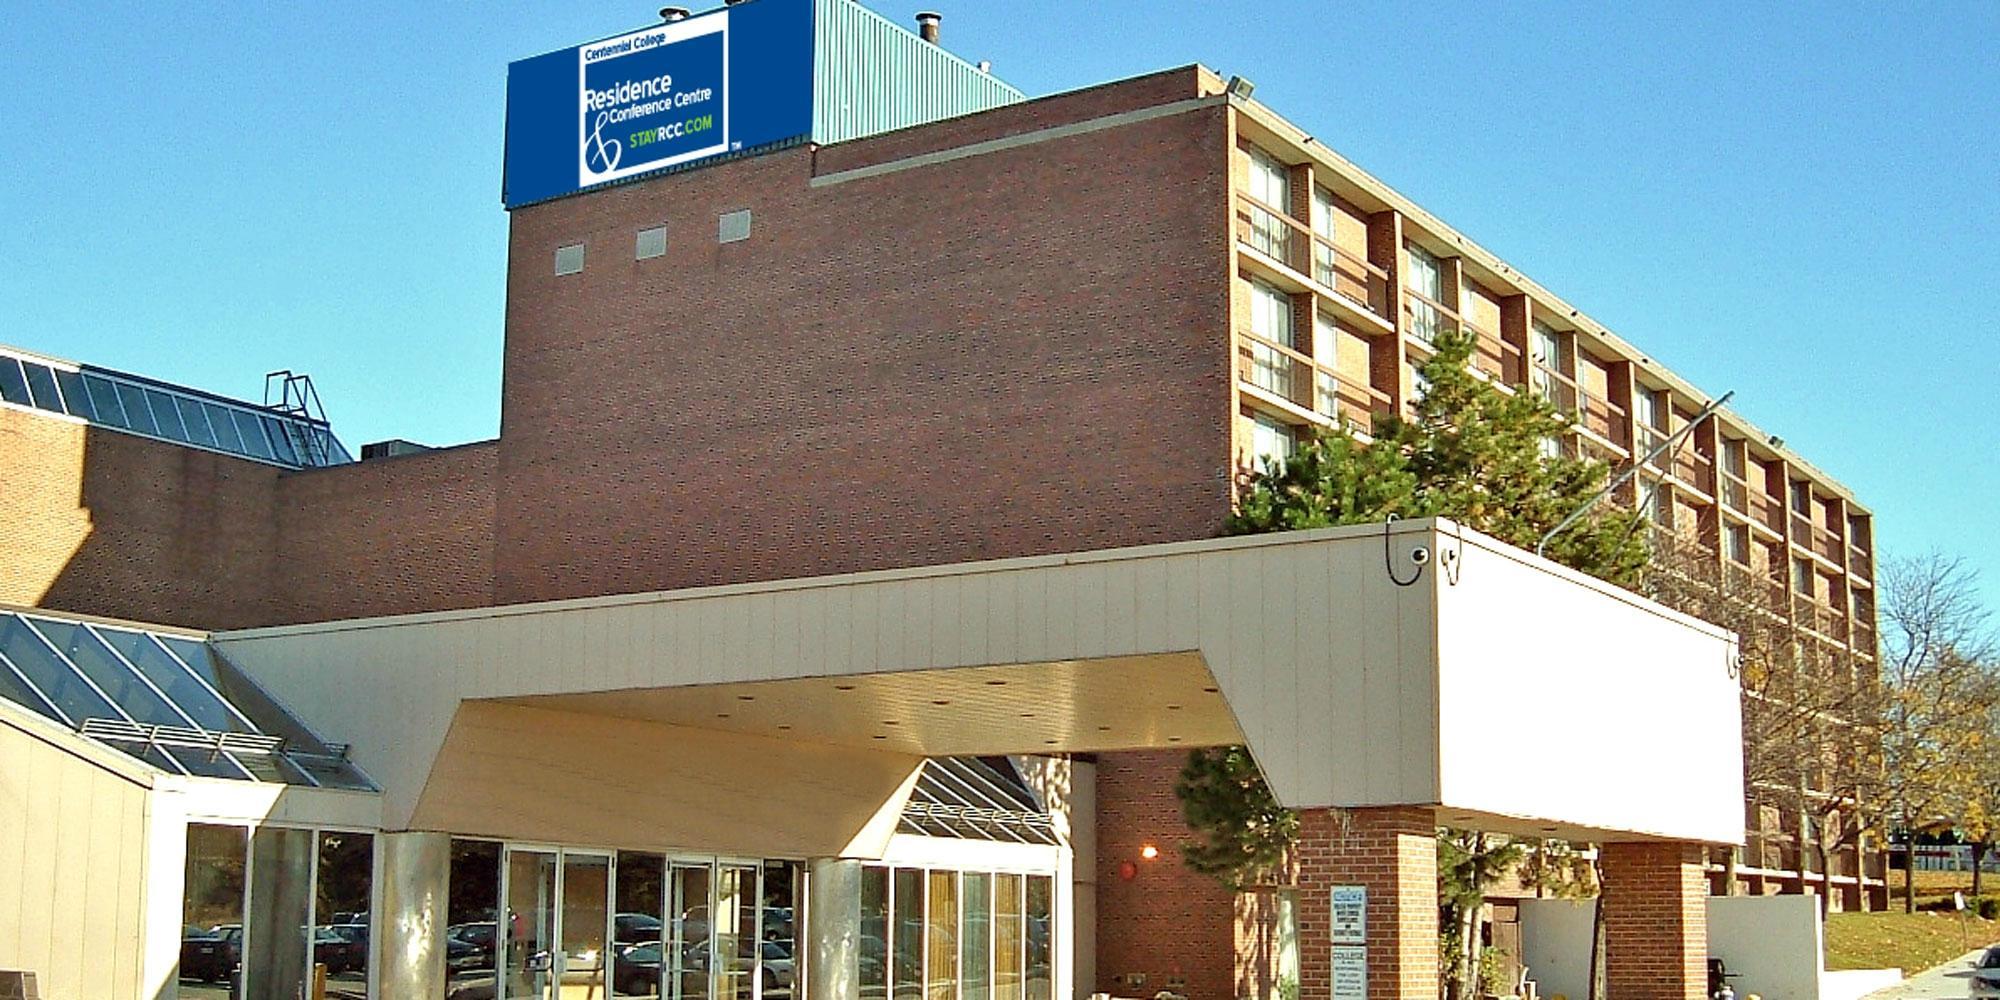 Centennial College Residence